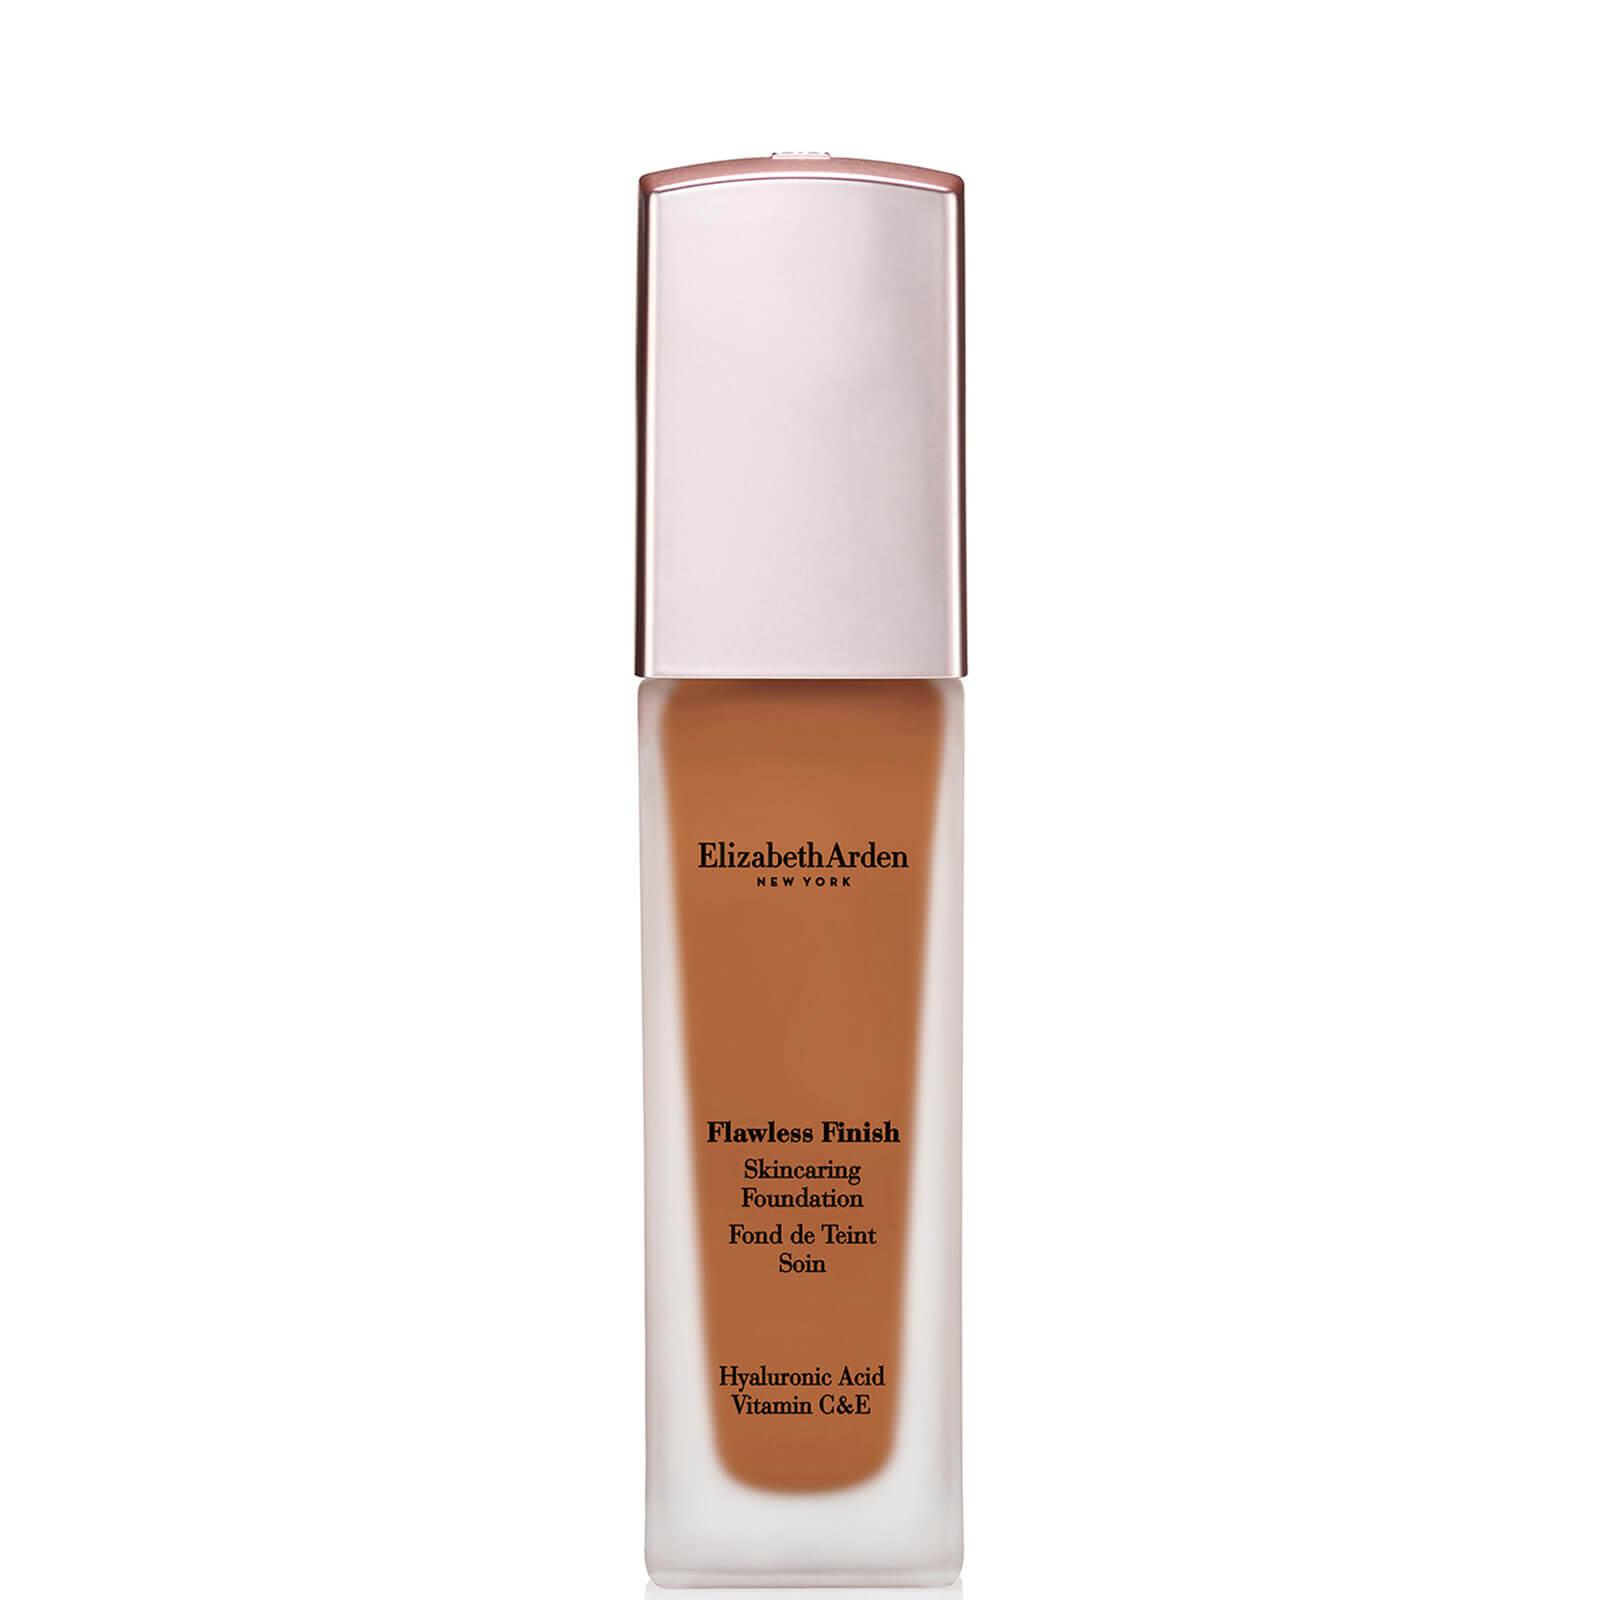 Elizabeth Arden Flawless Finish Skincaring Foundation 30ml (Various Shades) - 420C